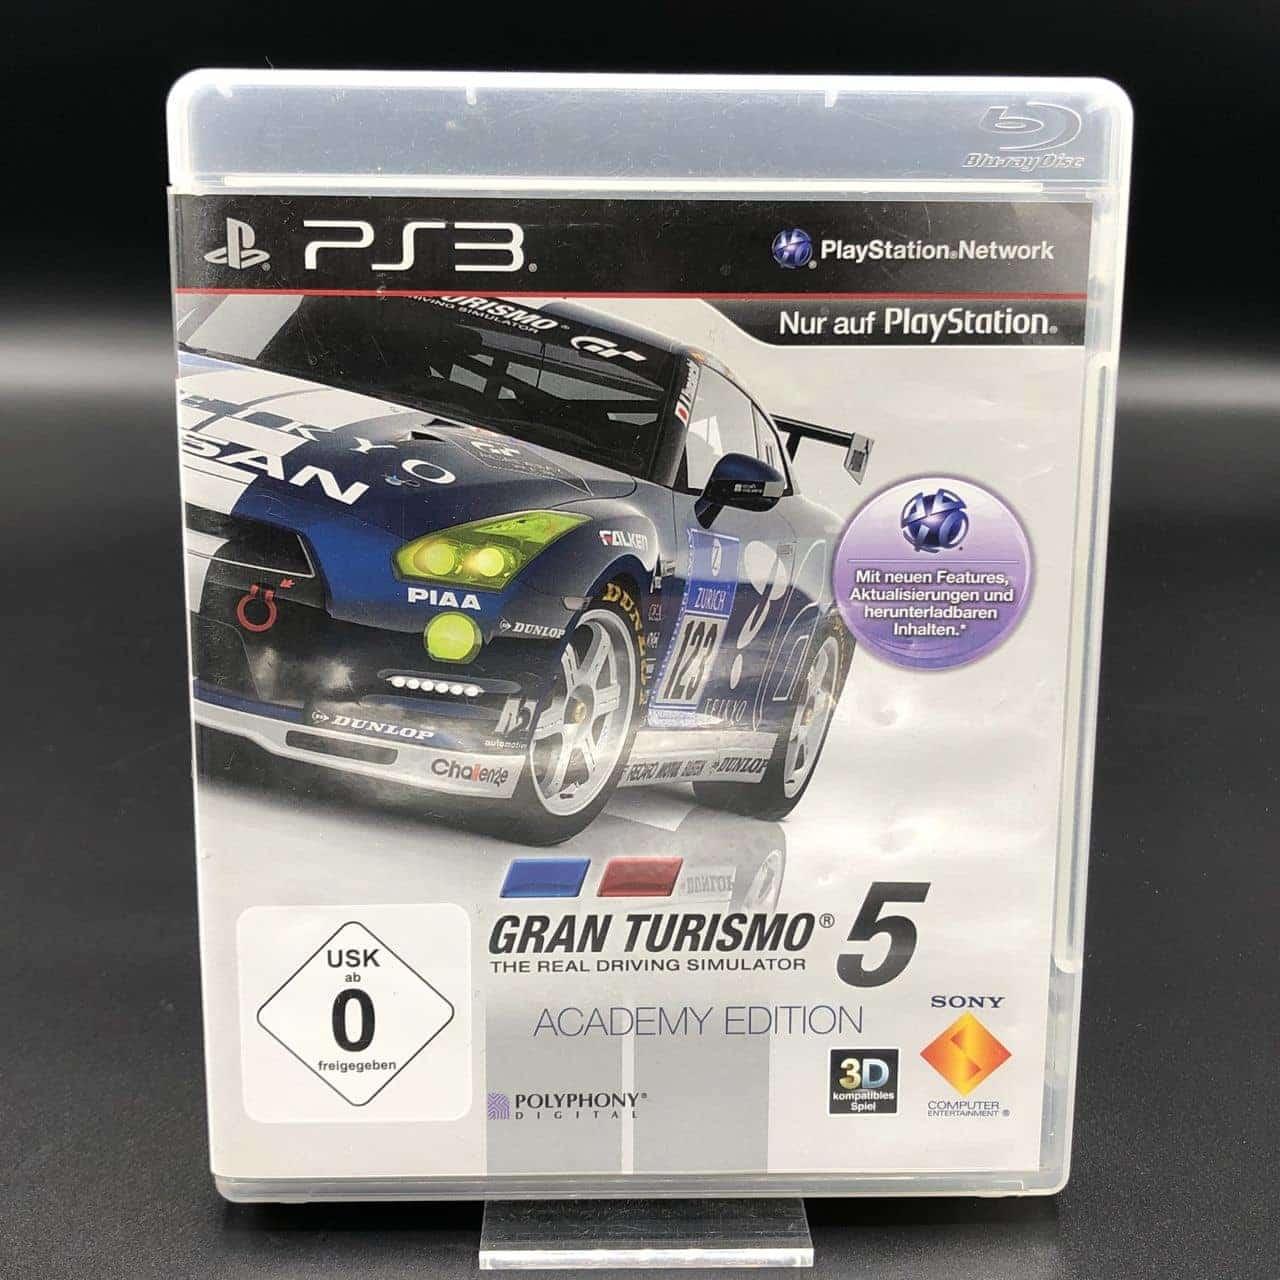 PS3 Gran Turismo 5 (Academy Edition) (Komplett) (Sehr gut) Sony PlayStation 3